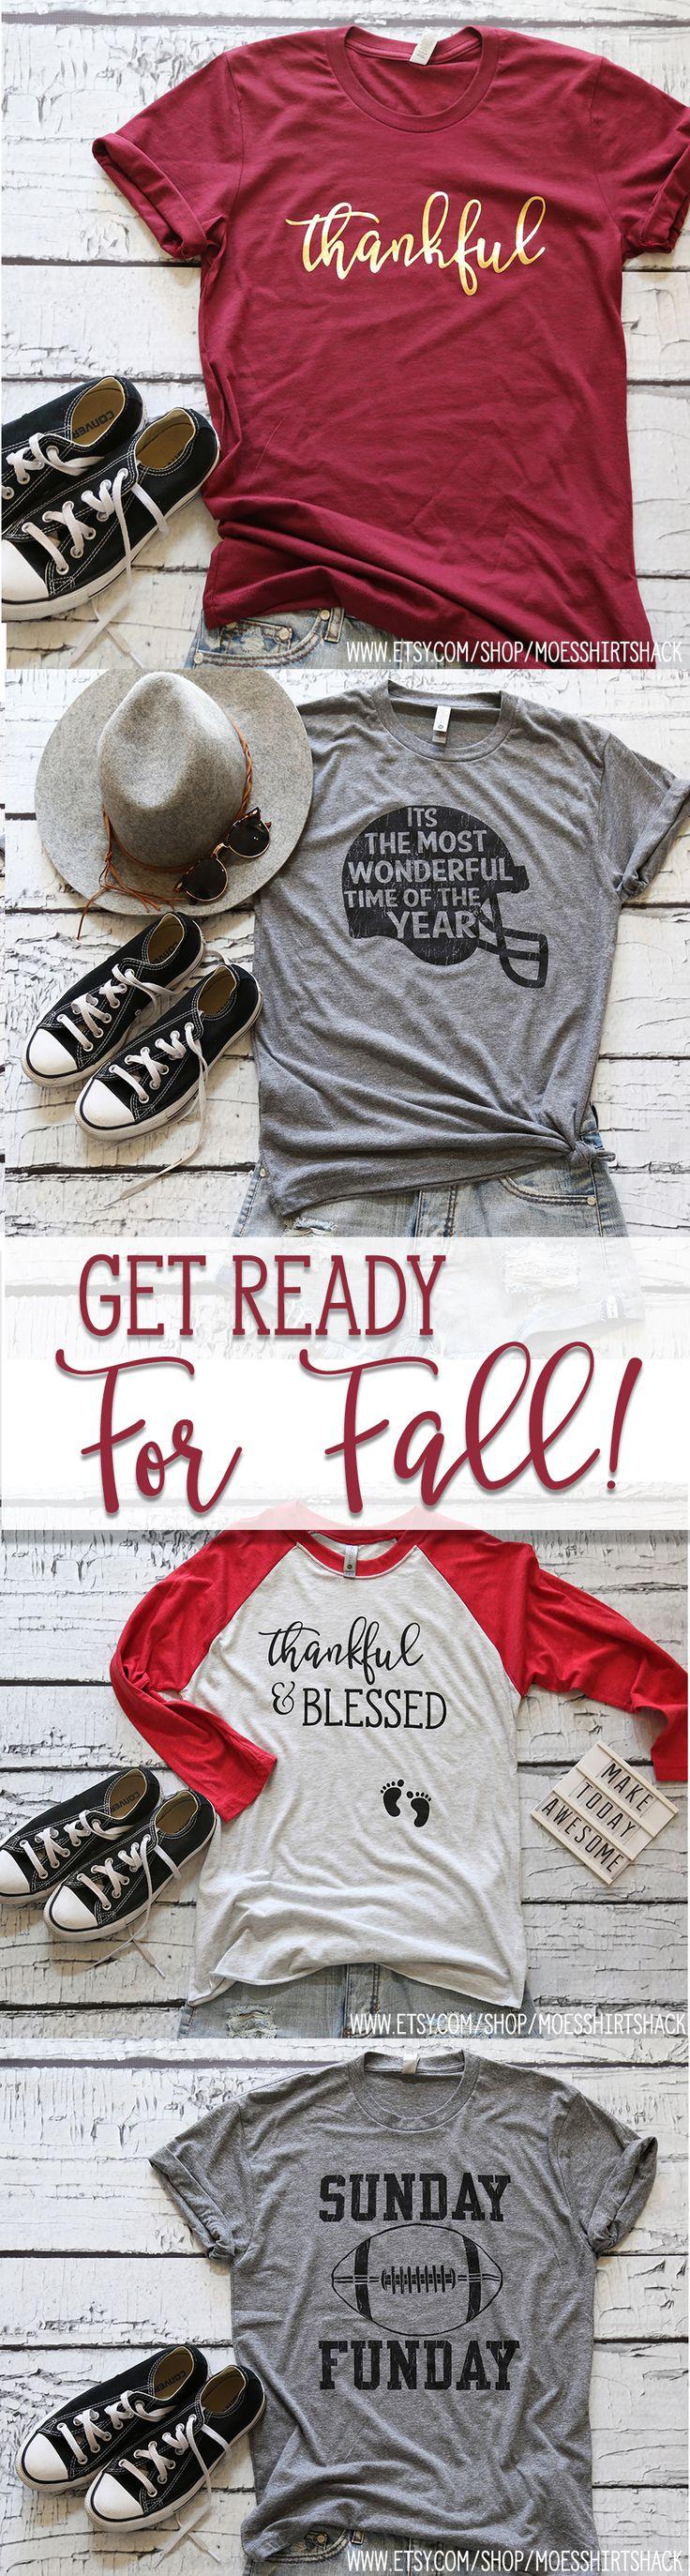 Football. Game Day. Football Shirt. Sunday Funday. Cute Football Shirt. Womens Shirt. Tailgating Shirt. College Football. Game Day T-shirt.Fall Shirts. Fall Shirt. Shirts For Fall. Womens Tshirt. Womens Shirt. Pumpkin Spice Shirt. Fall T-shirt For Women.